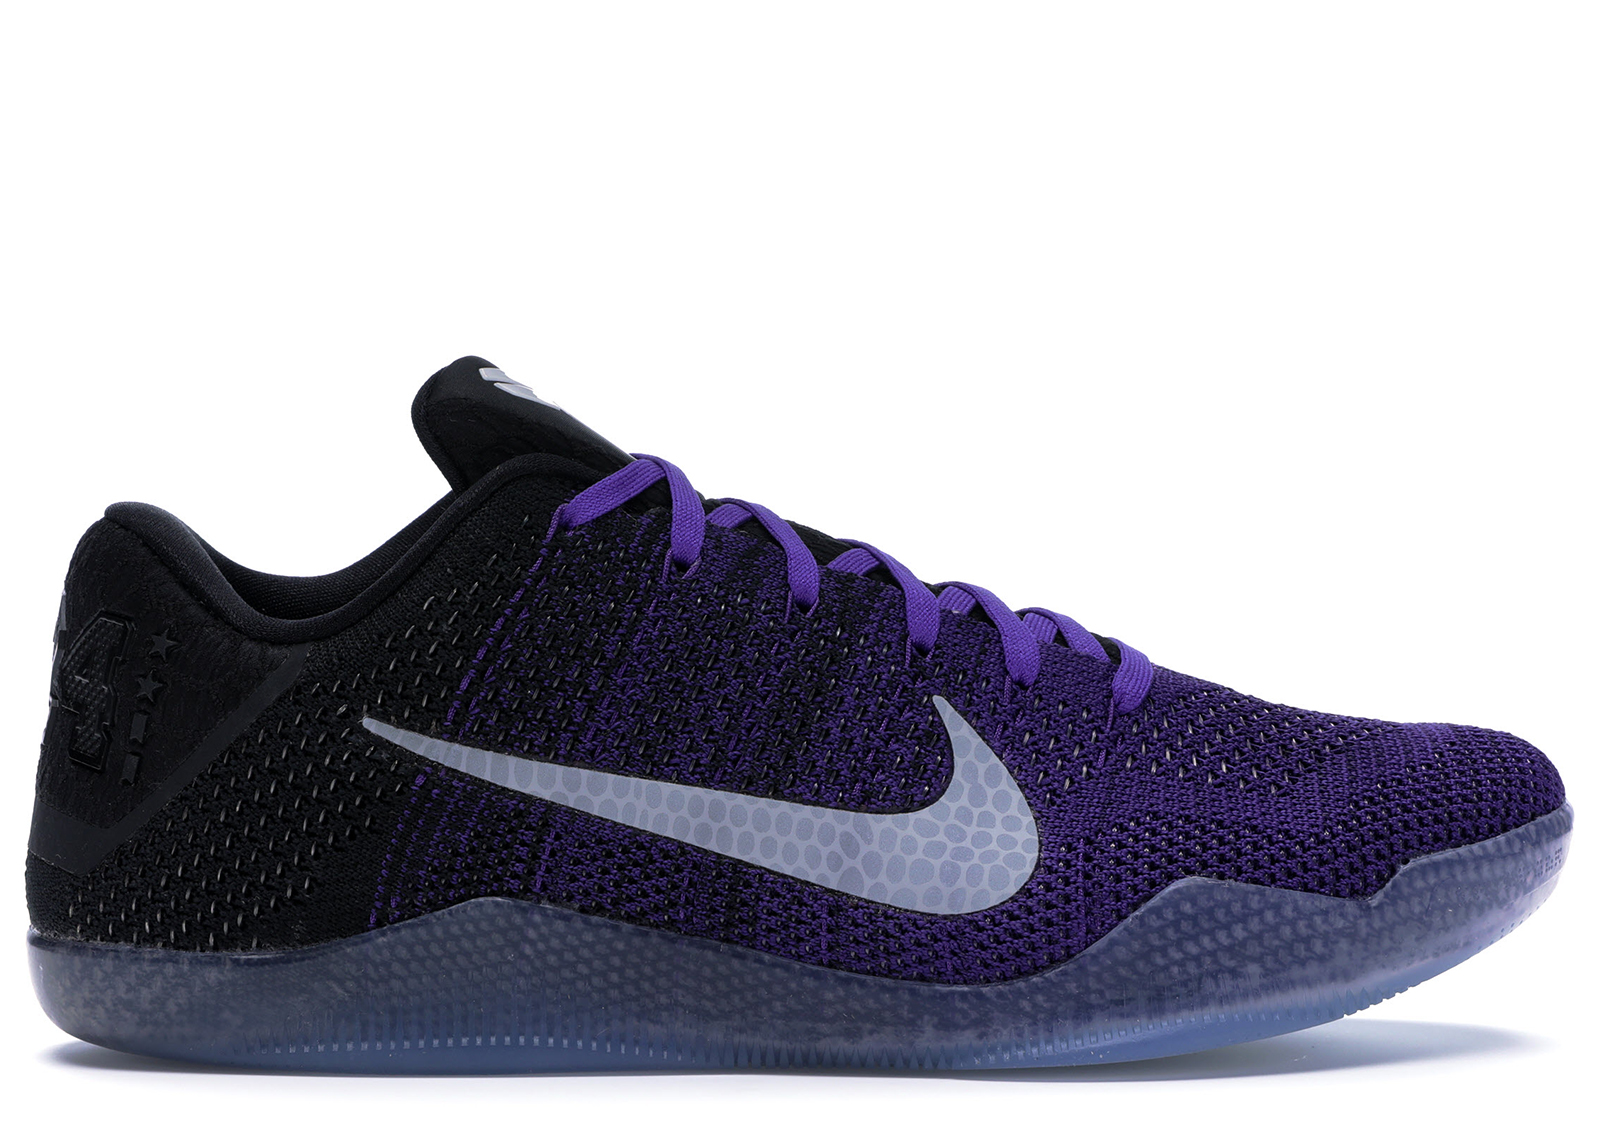 Nike Kobe 11 Elite Low Eulogy Hyper